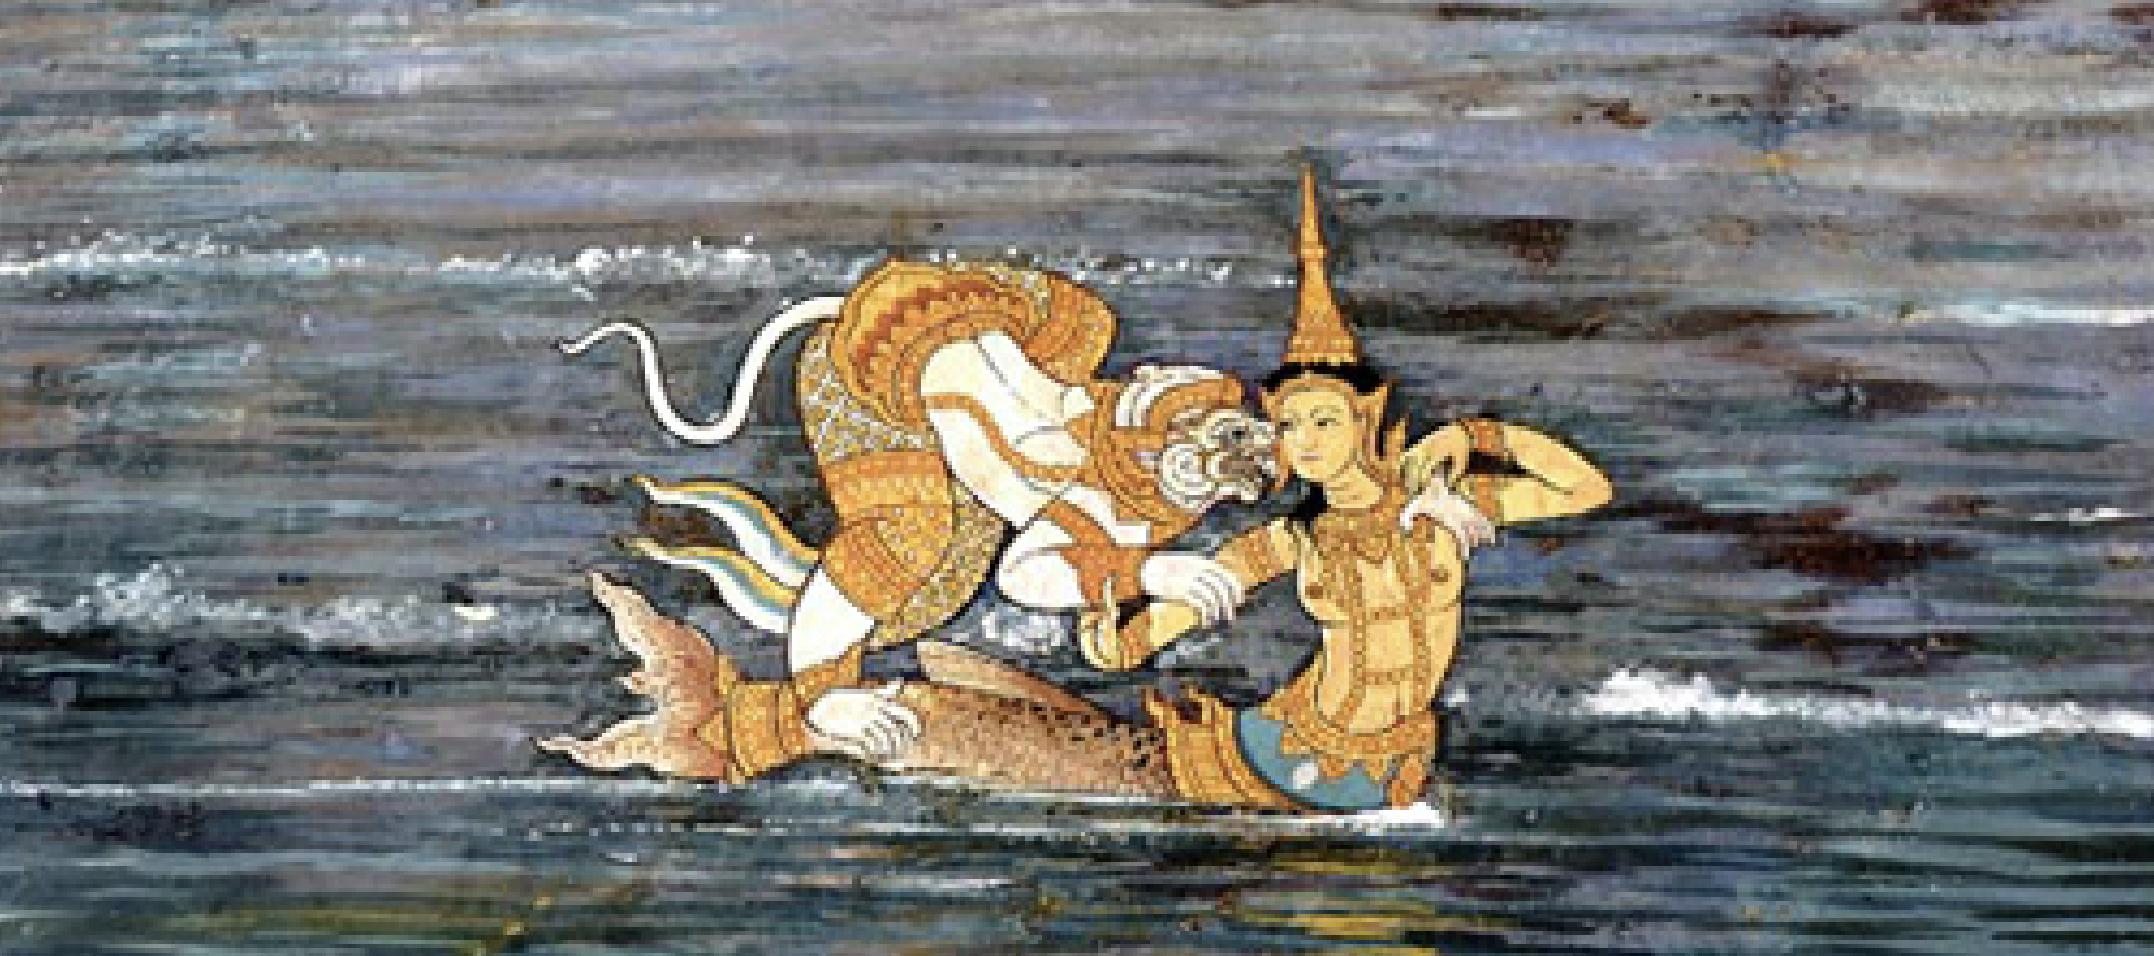 Hanuman and Mermaid Suvannamaccha. Photocopy of a mural painting in Wat Phra Kaew, Bangkok (Wikimedia Commons)